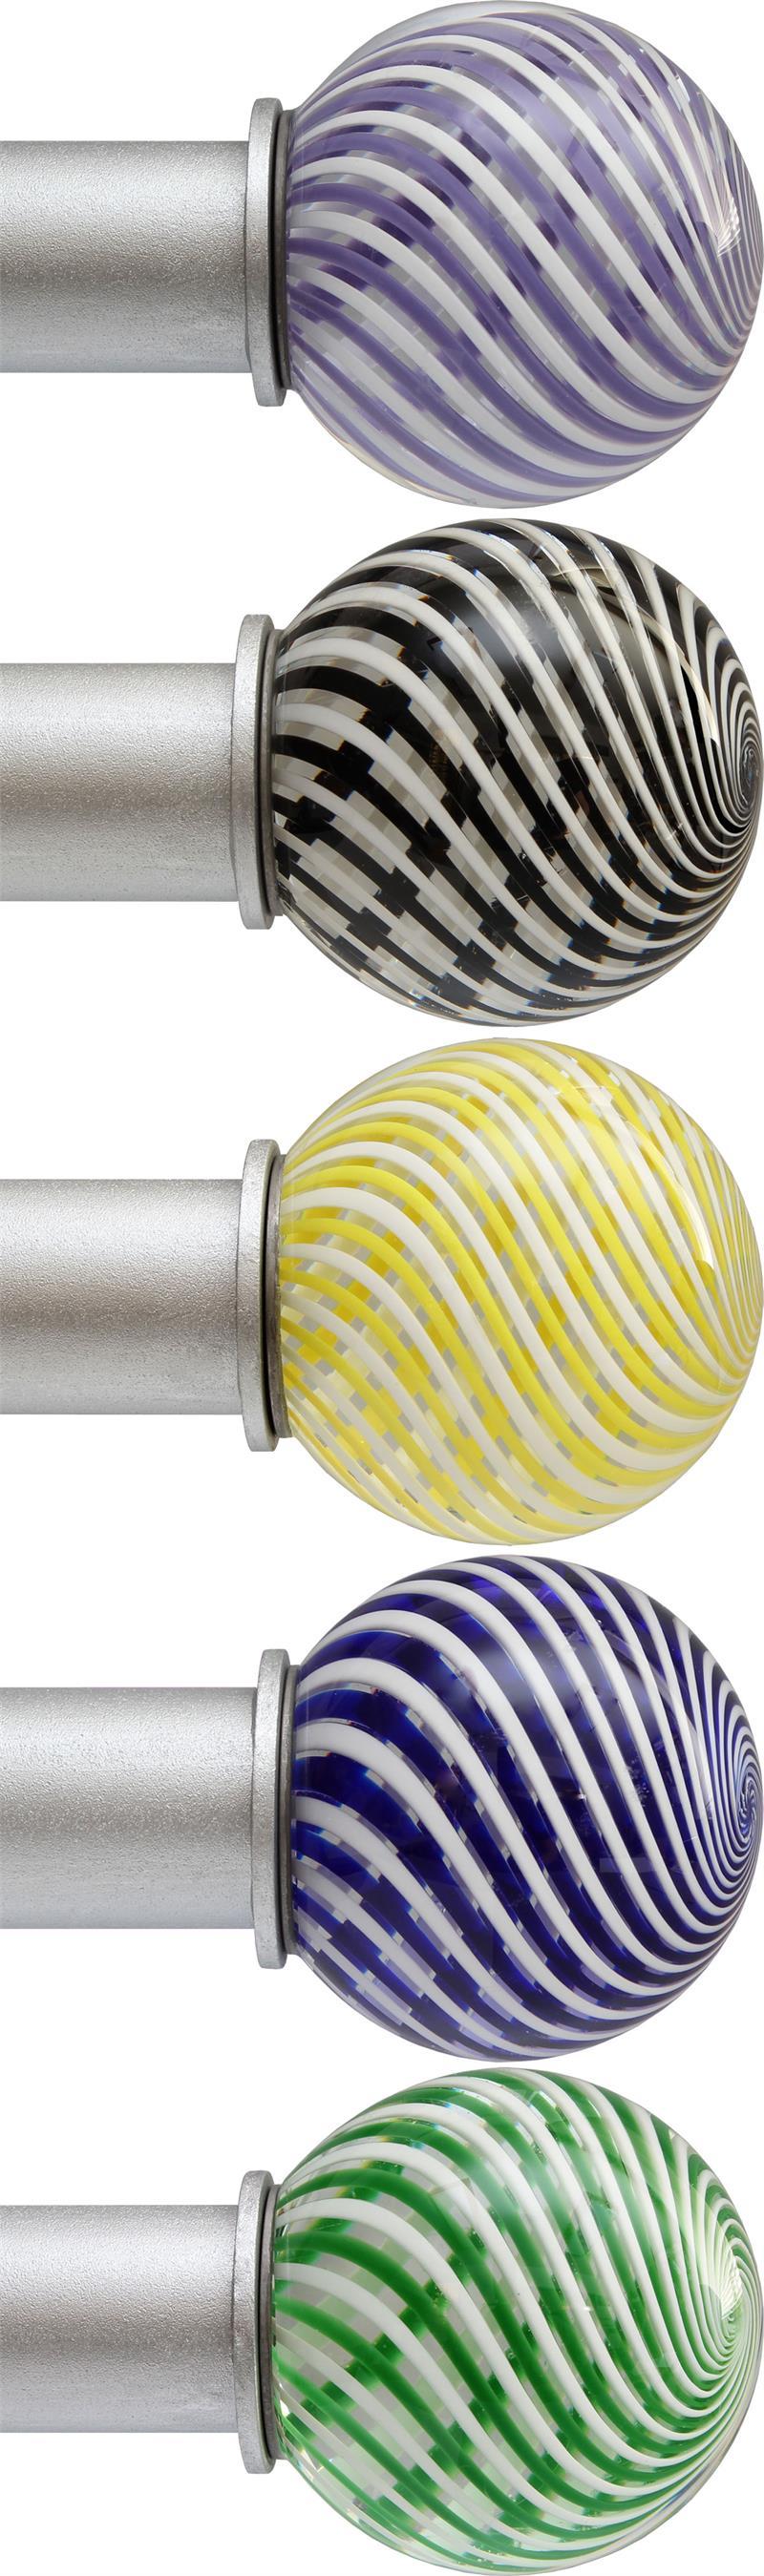 artist glass swirl ball custom 1 dia iron curtain rod bestwindowtreatments com